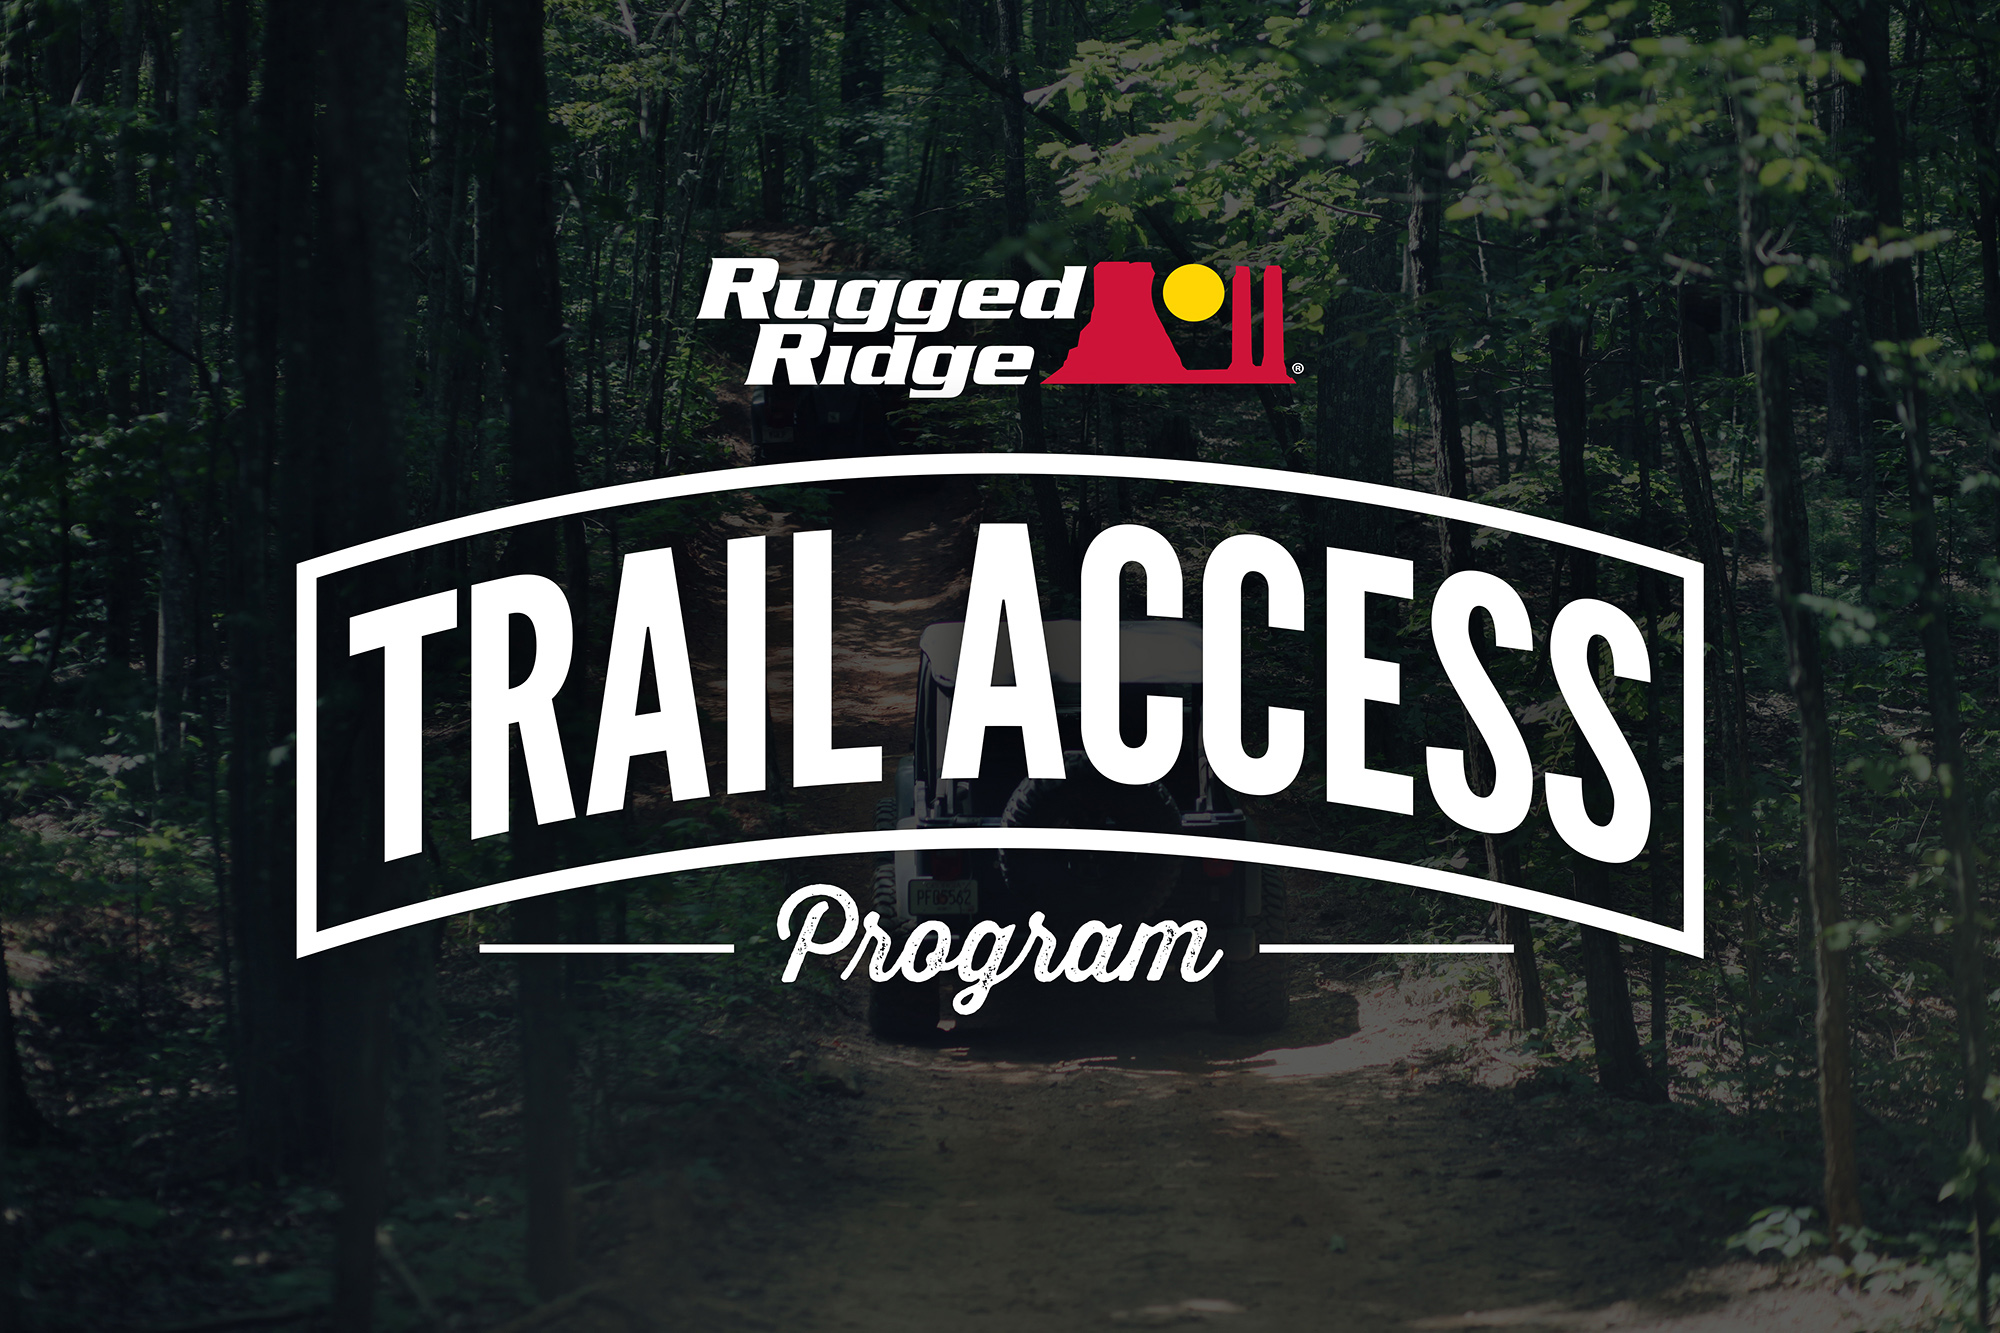 Rugged Ridge Trail Access Program